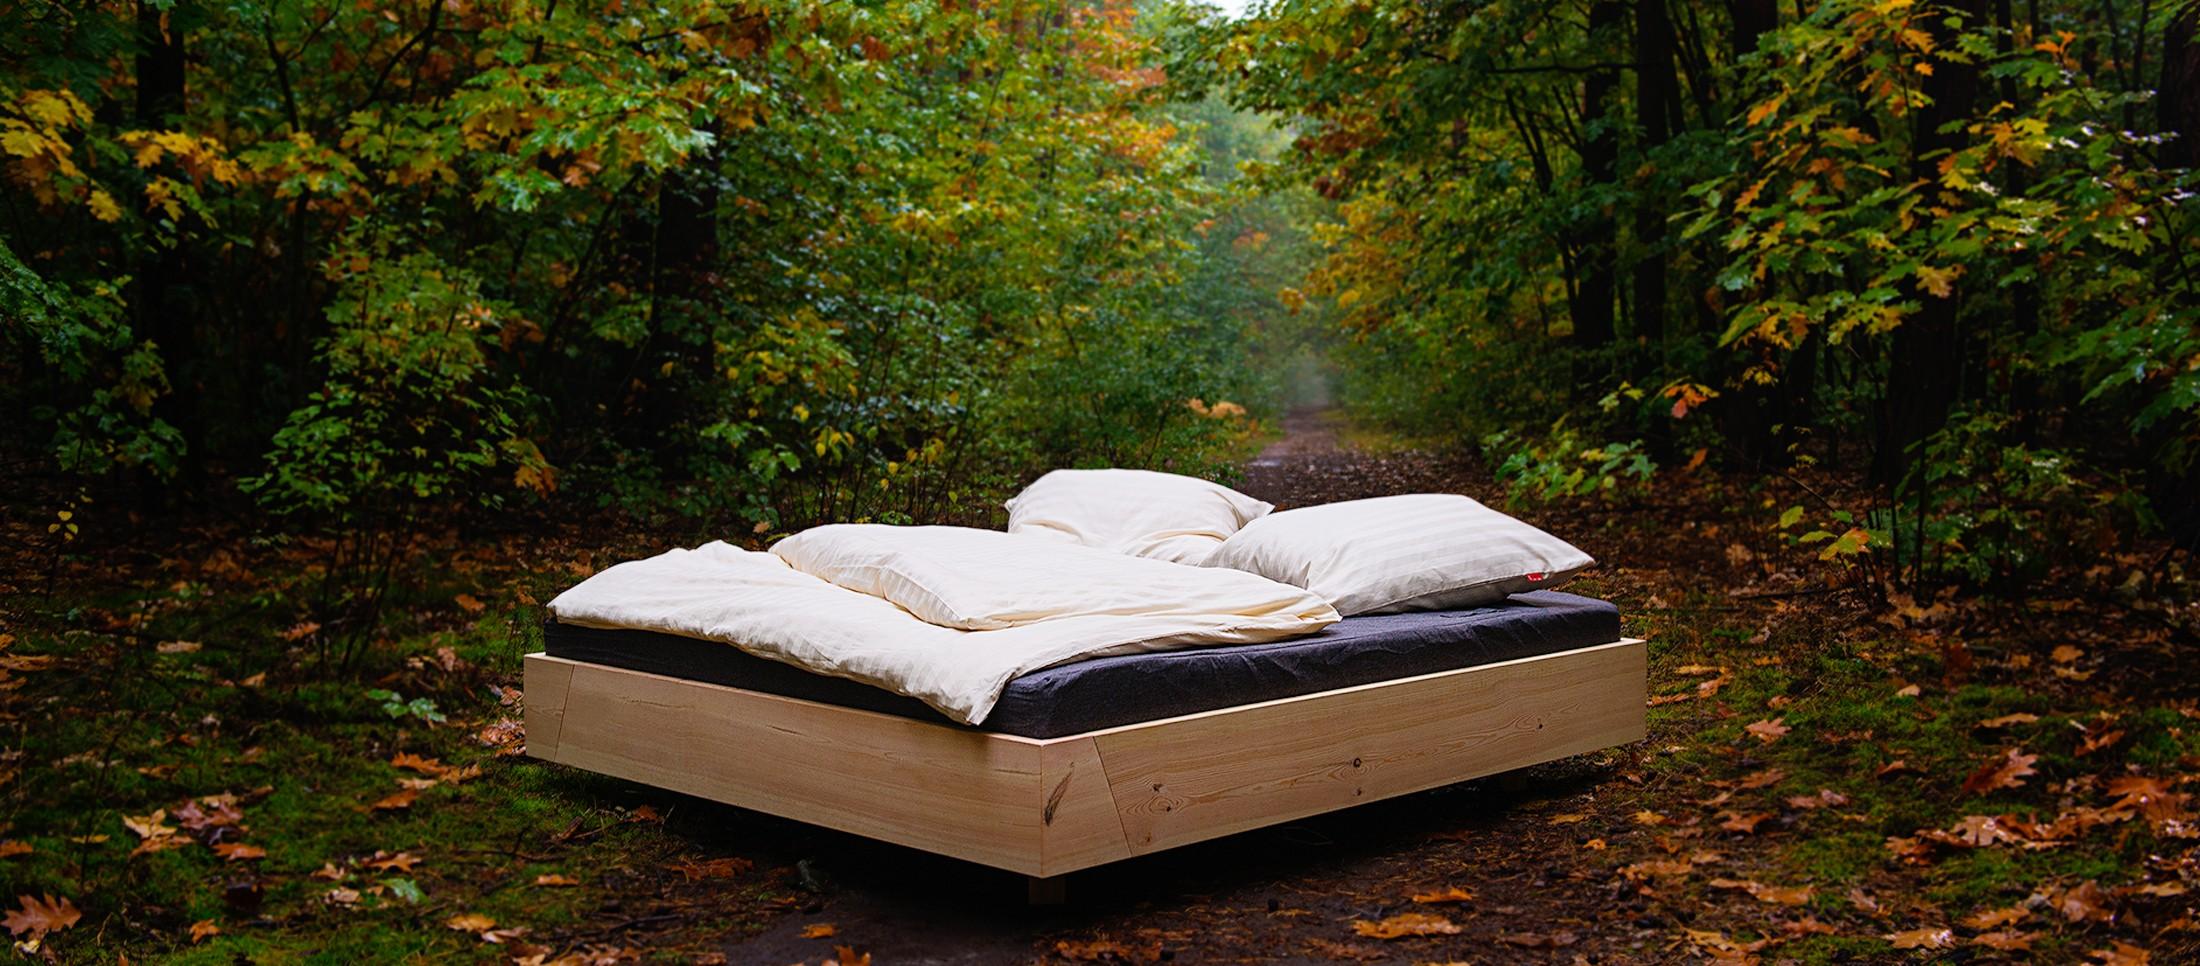 Ein Bett im Wald? Nunja. (Foto: Julia Kneuse / kneuse.de)